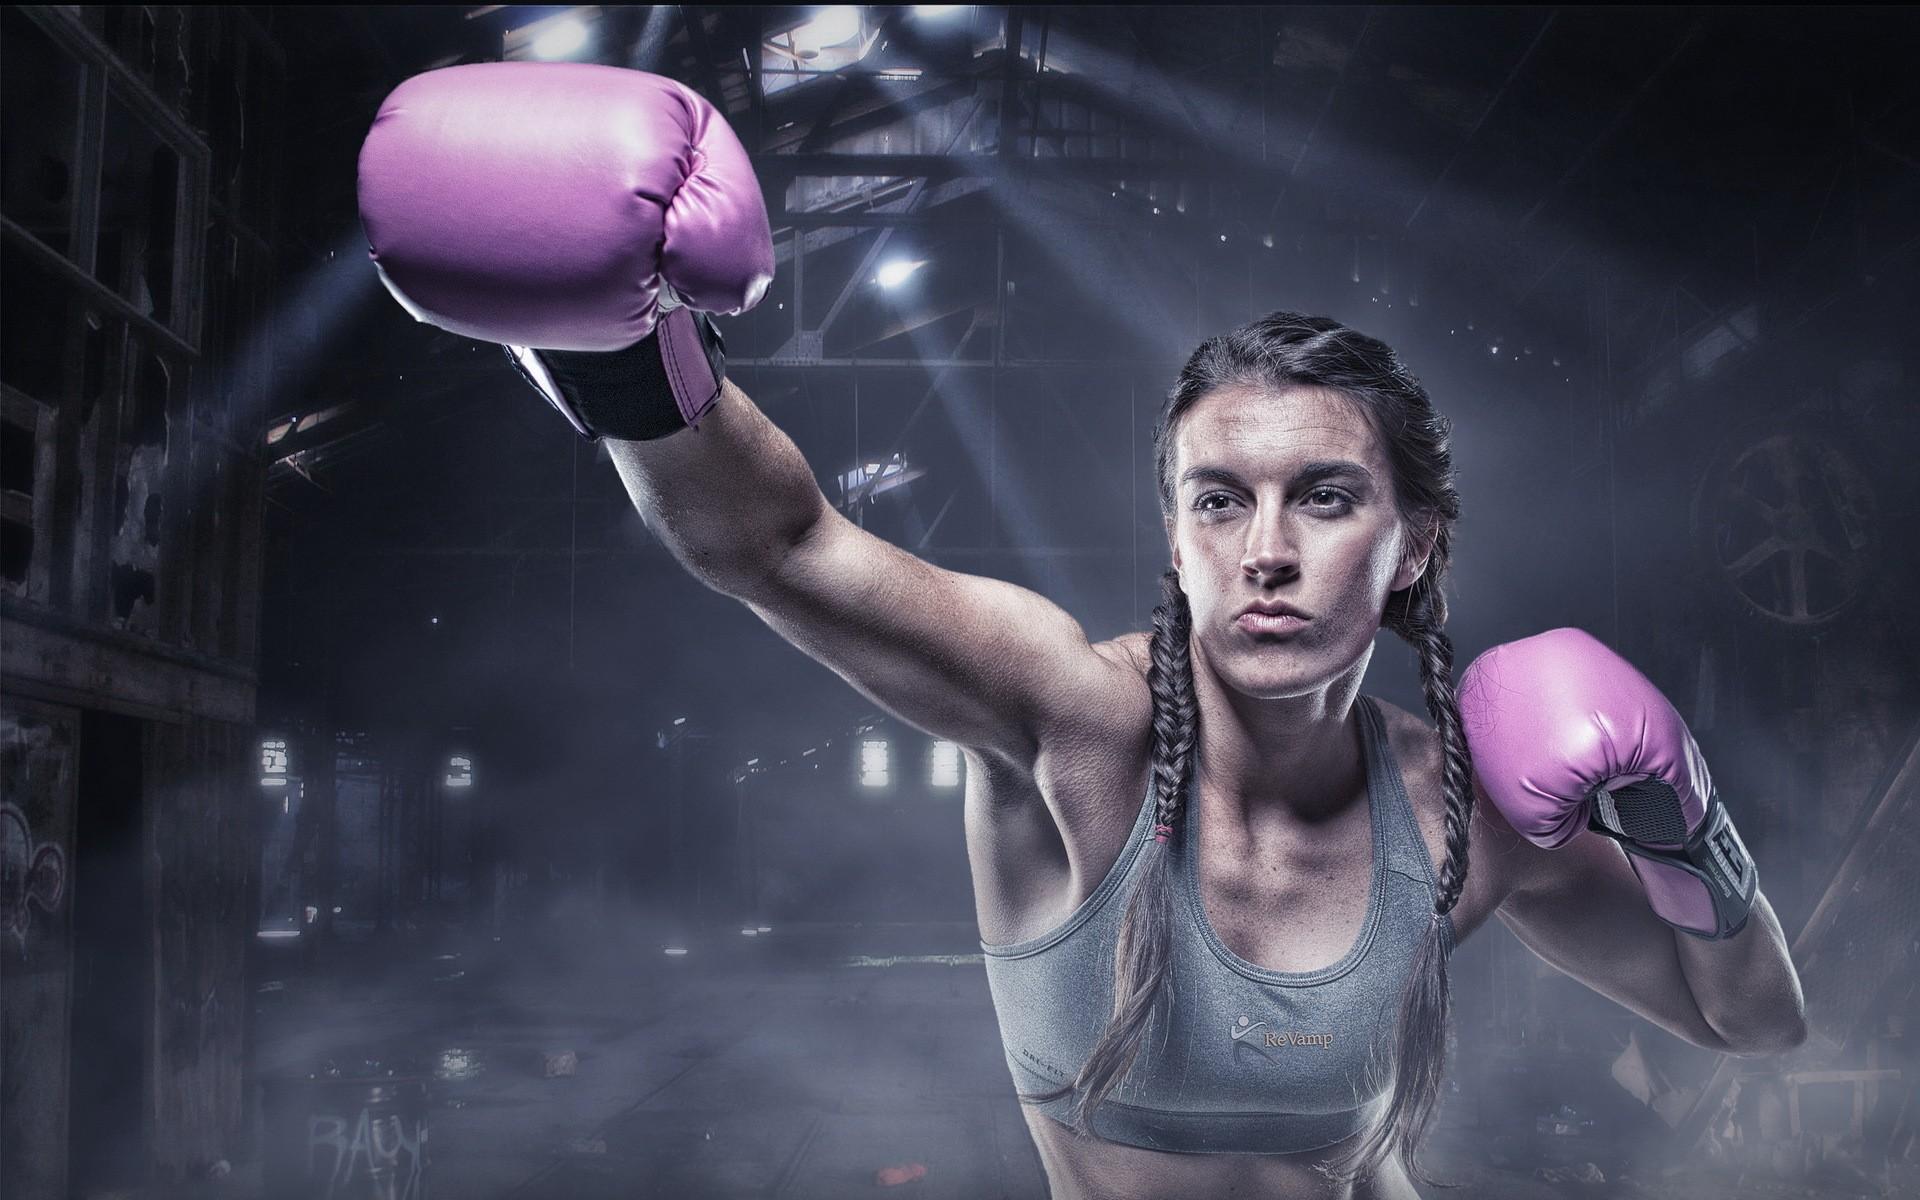 General 1920x1200 boxing women sports sports bra boxing gloves HDR sun rays